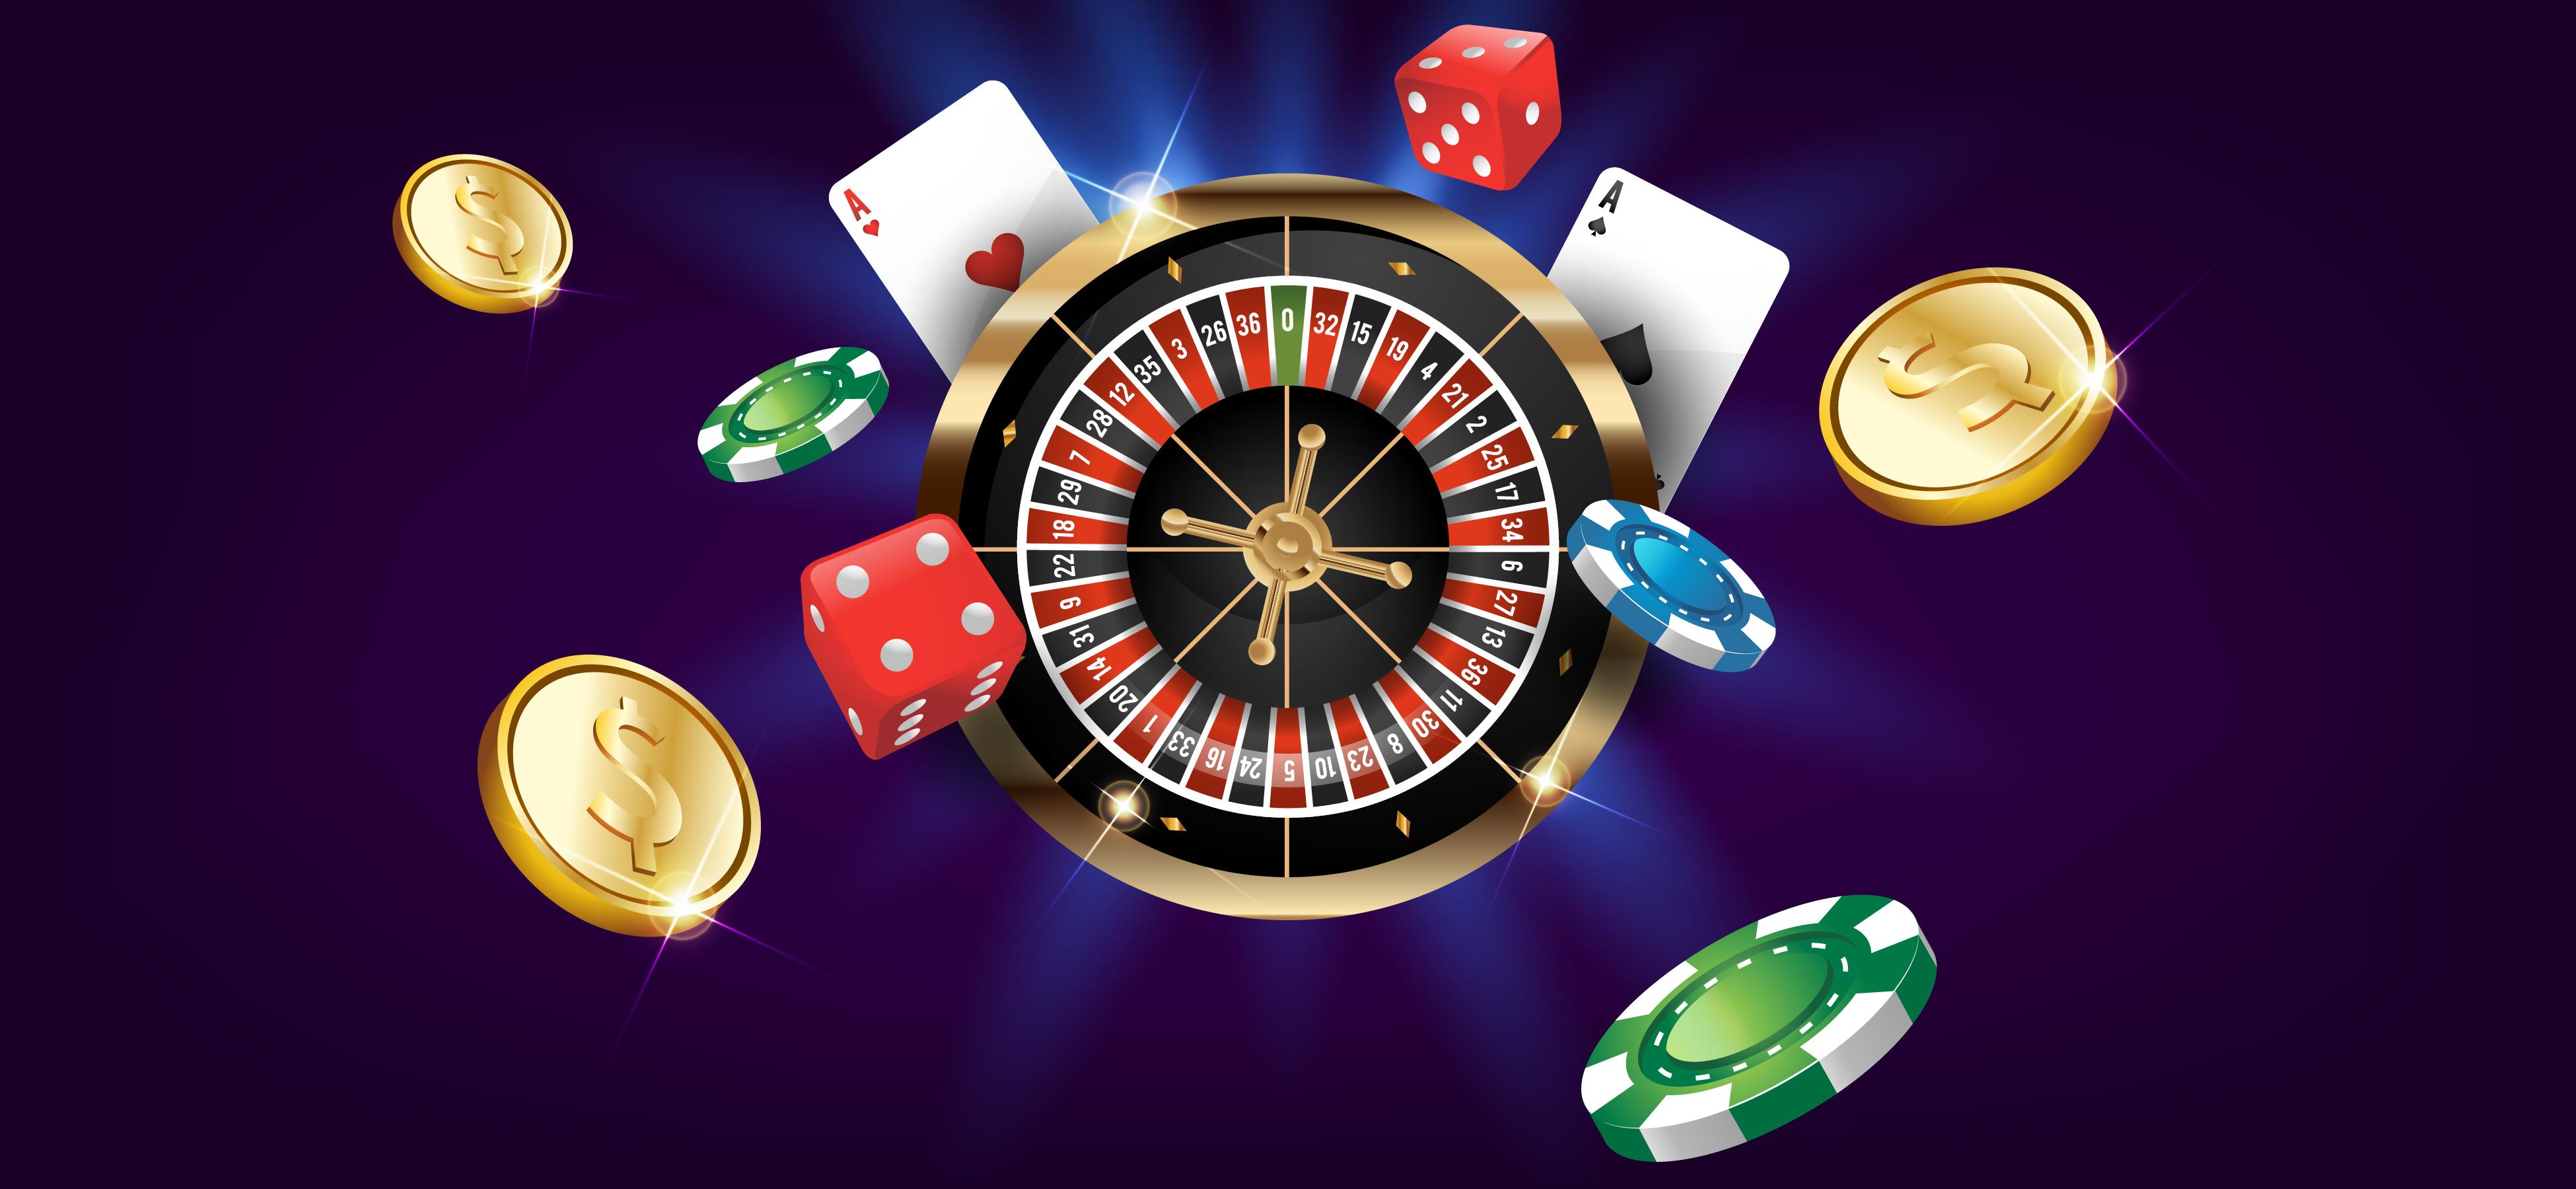 Google 1 Page,  Agen judi Bola,  Poker,  Gambling,  Casino,  Sport,  Betting Website 1 Keyword Guarantee